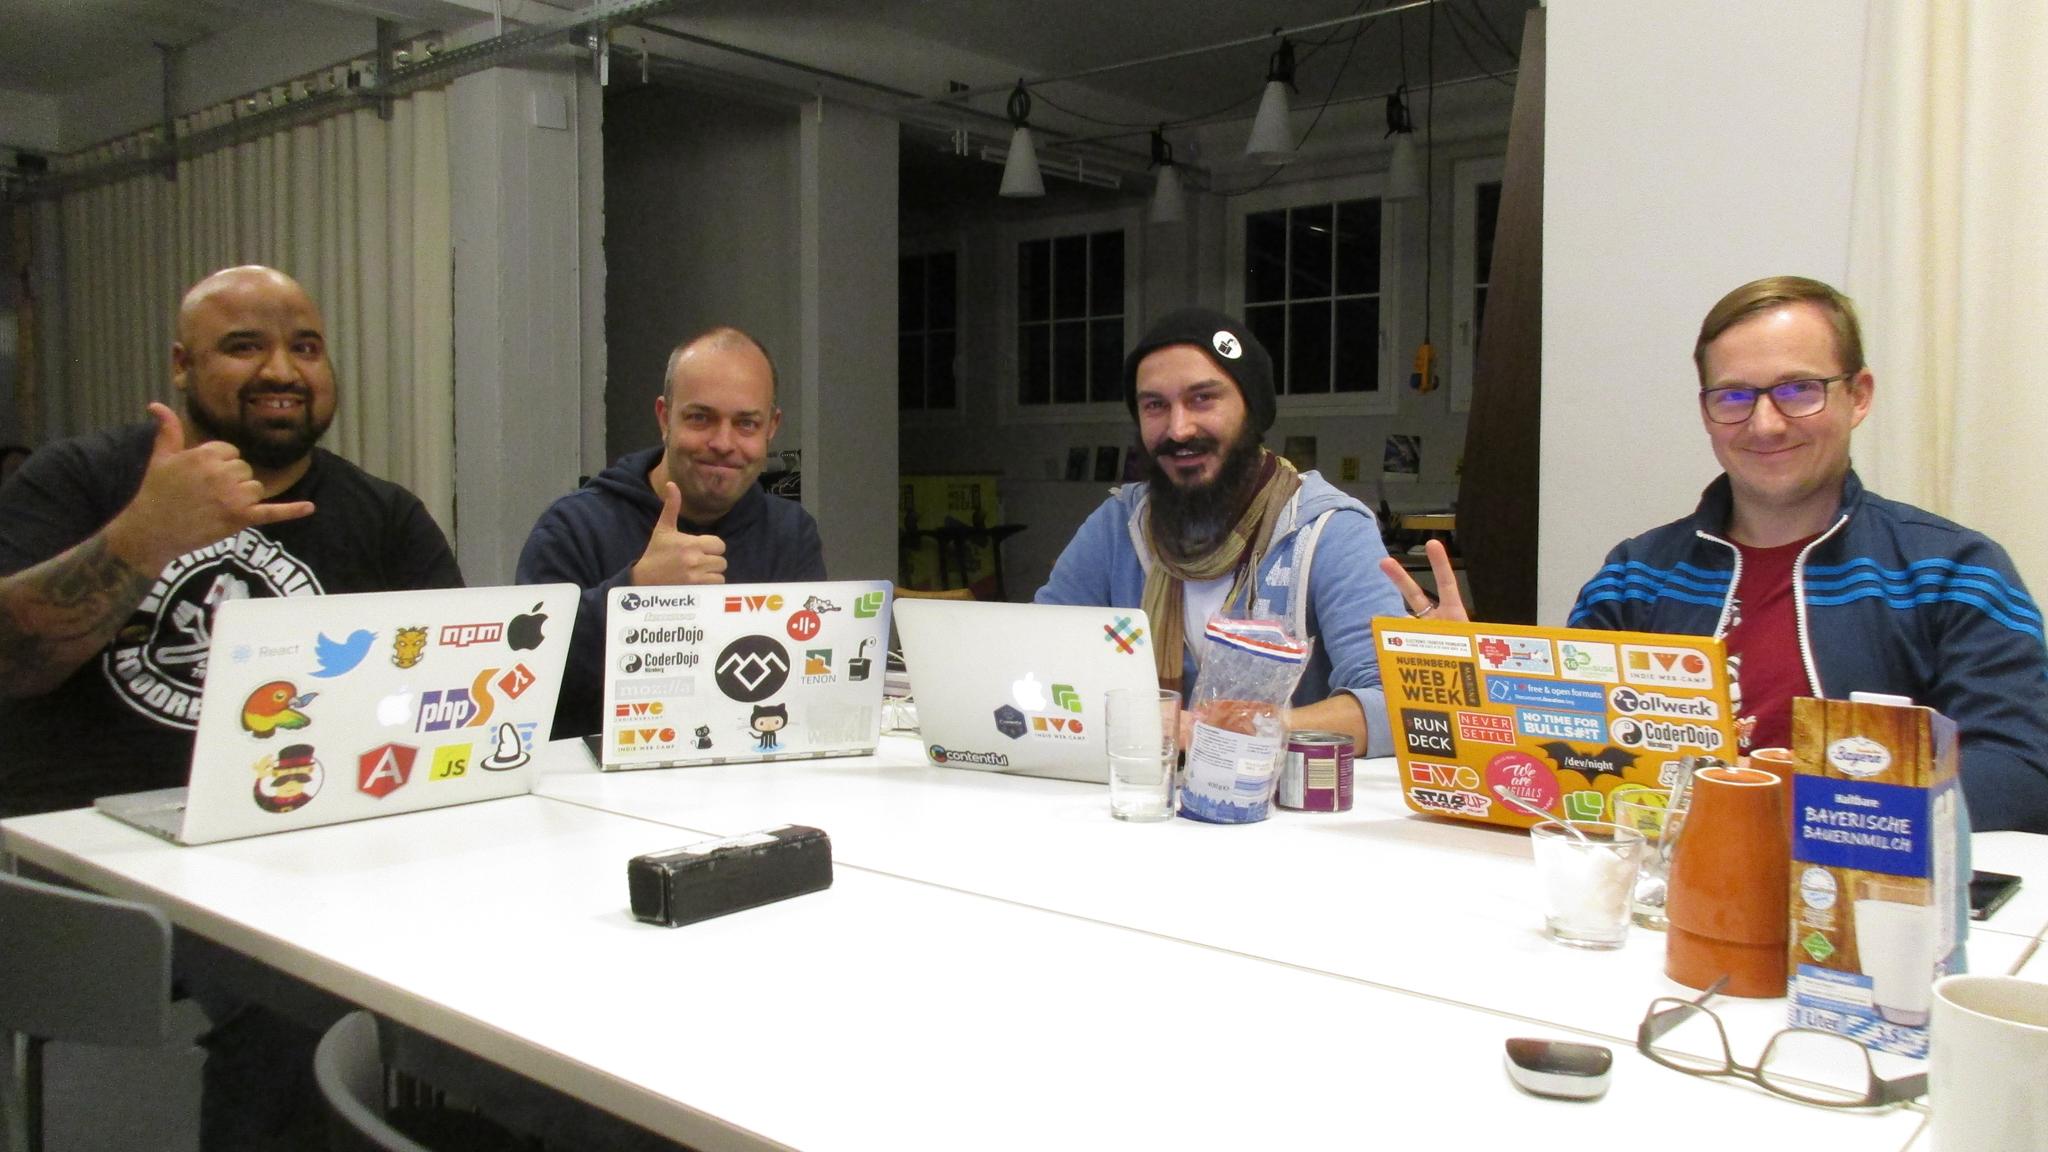 Attendees of the Homebrew Website Club Nürnberg 2017-11-22